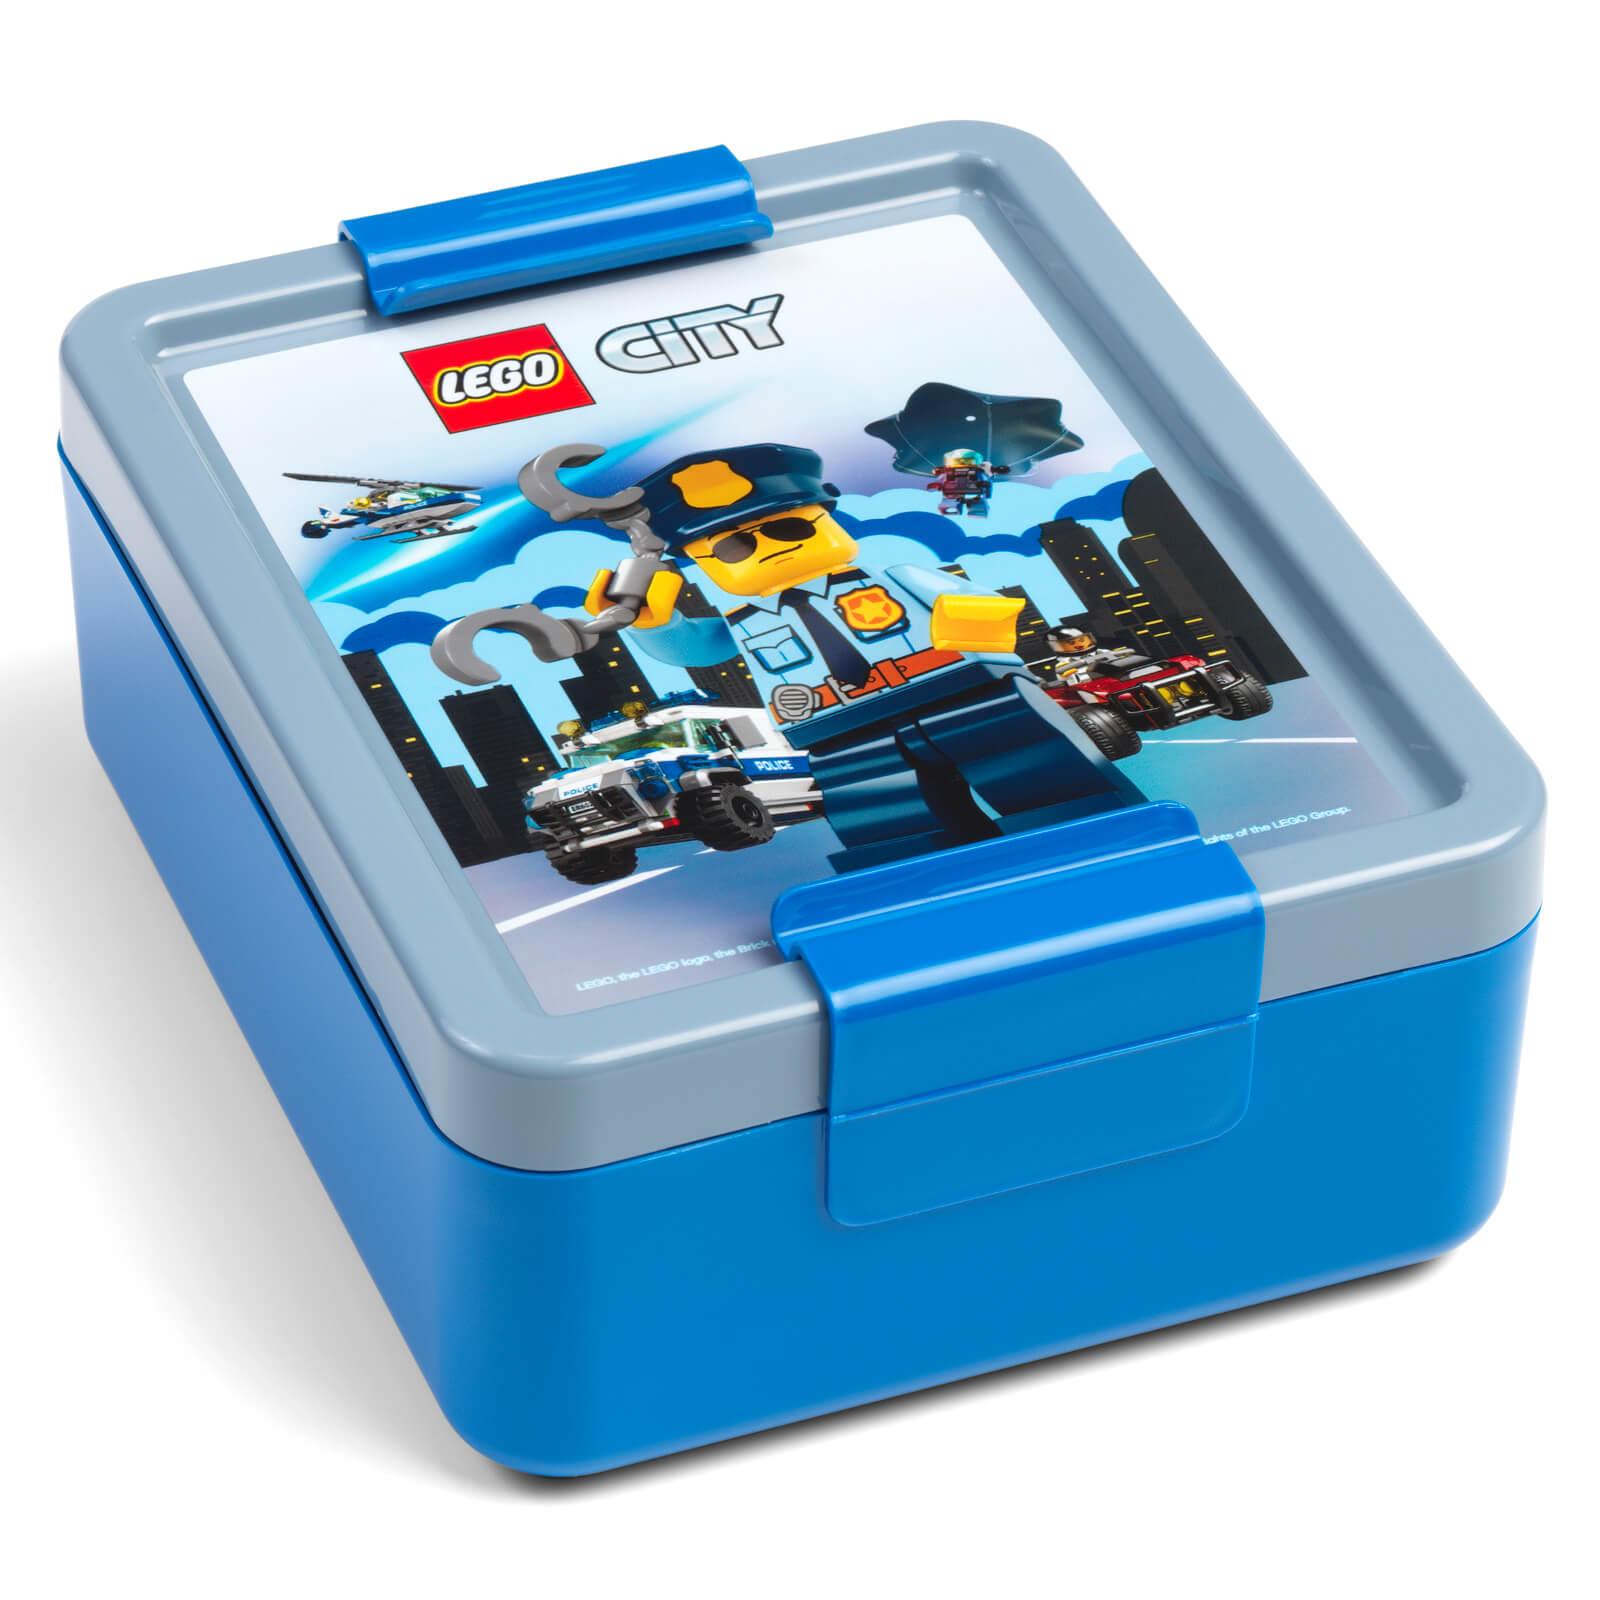 Image of LEGO Storage City Lunch Box